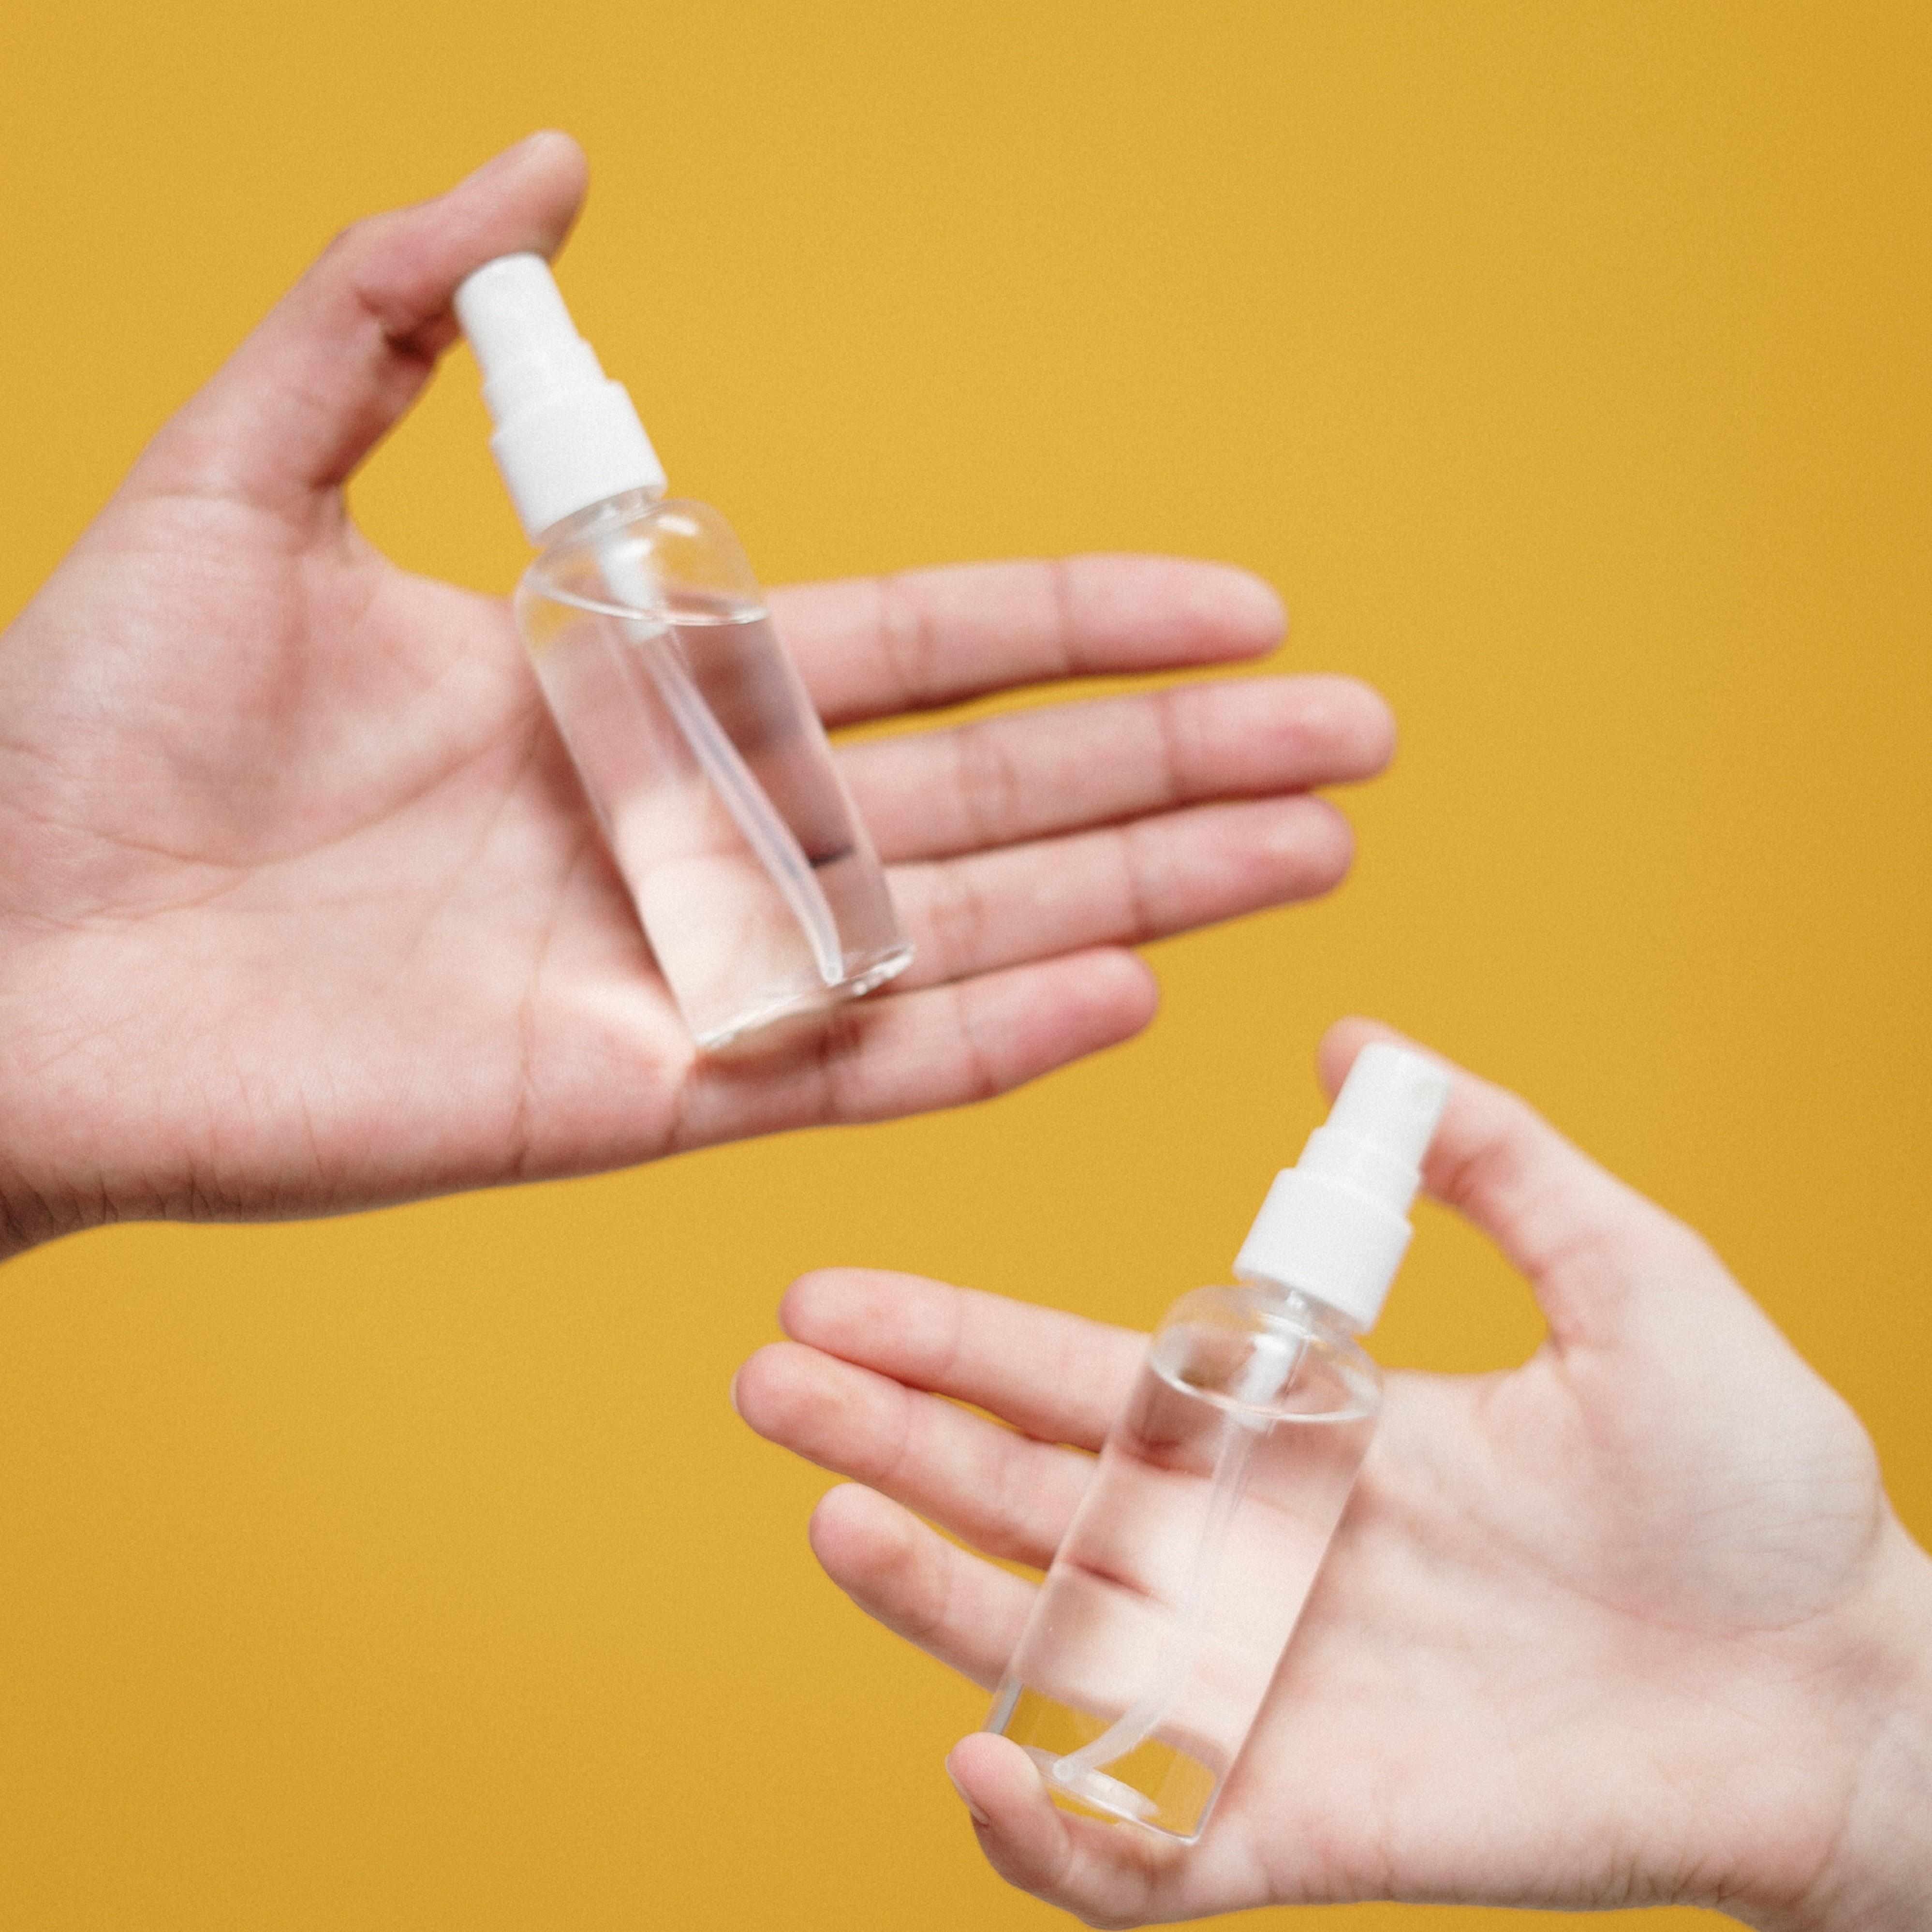 Hands Holding Liquids.